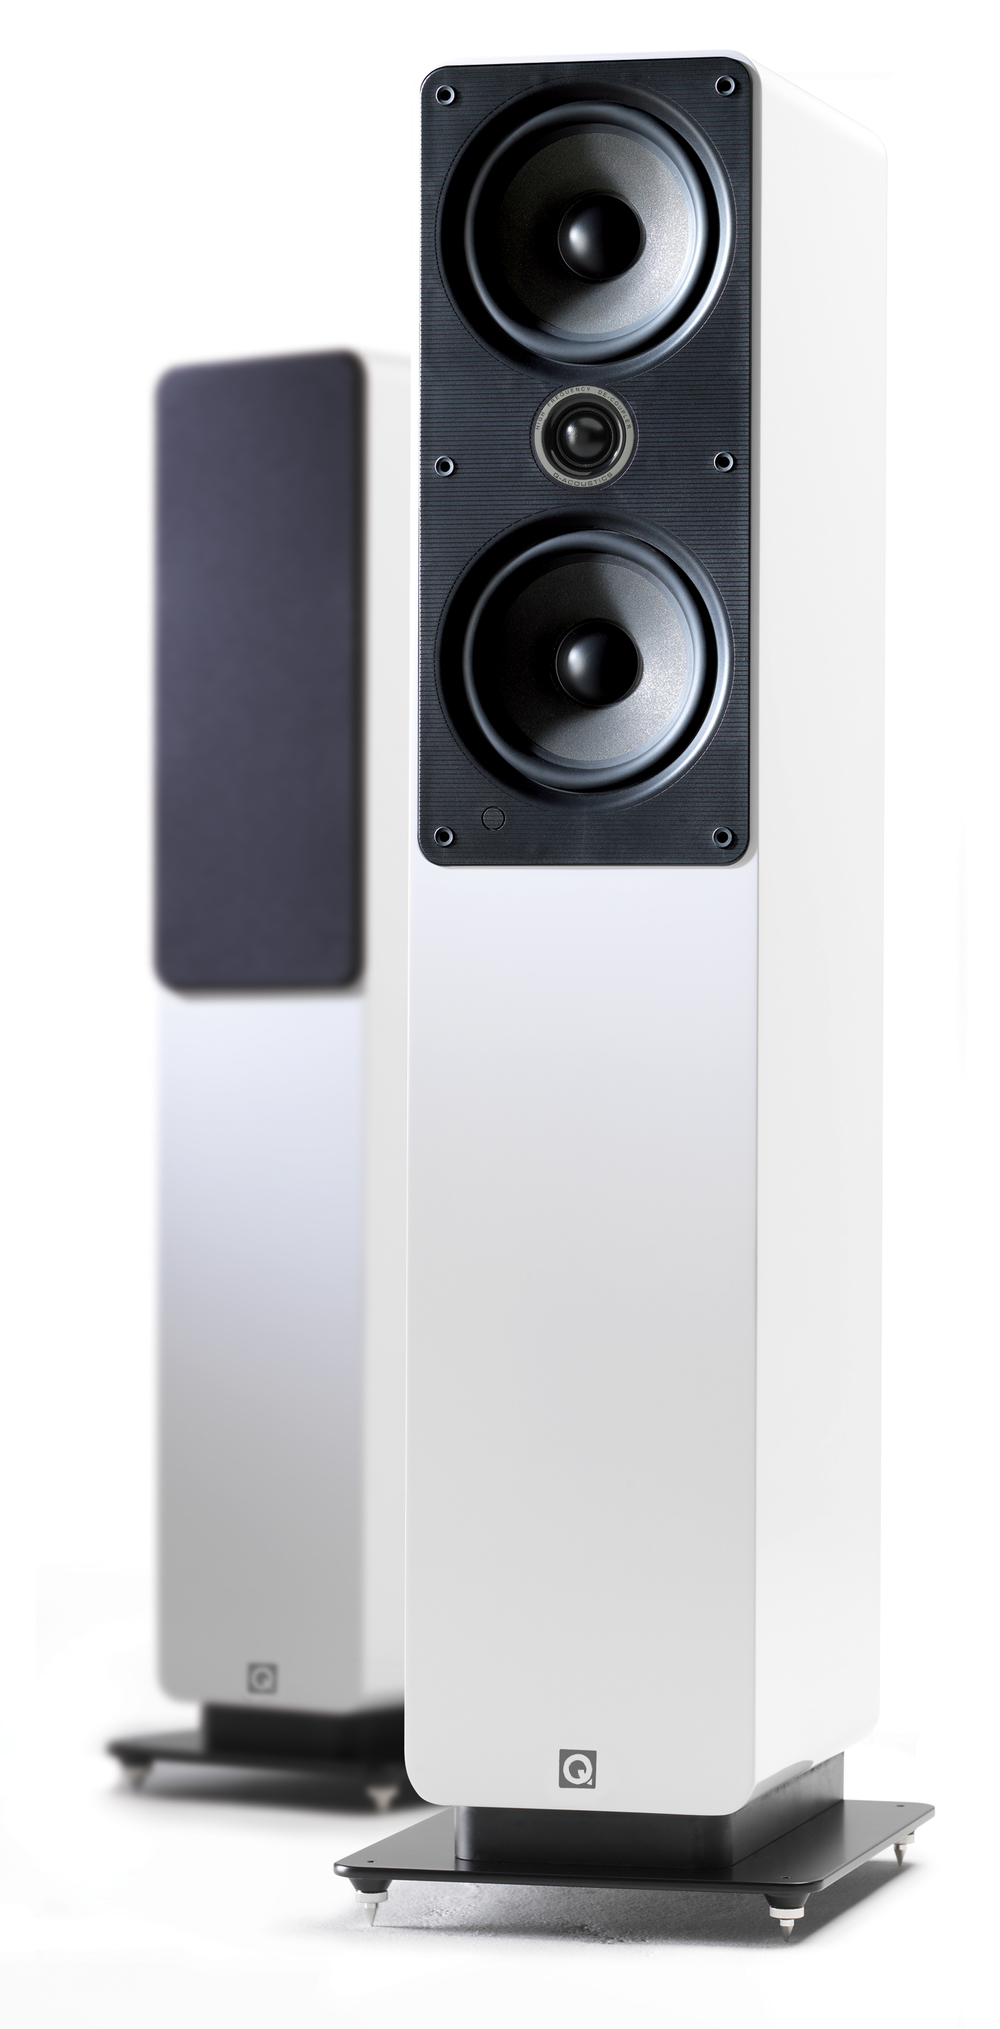 Image Credit: Q Acoustics